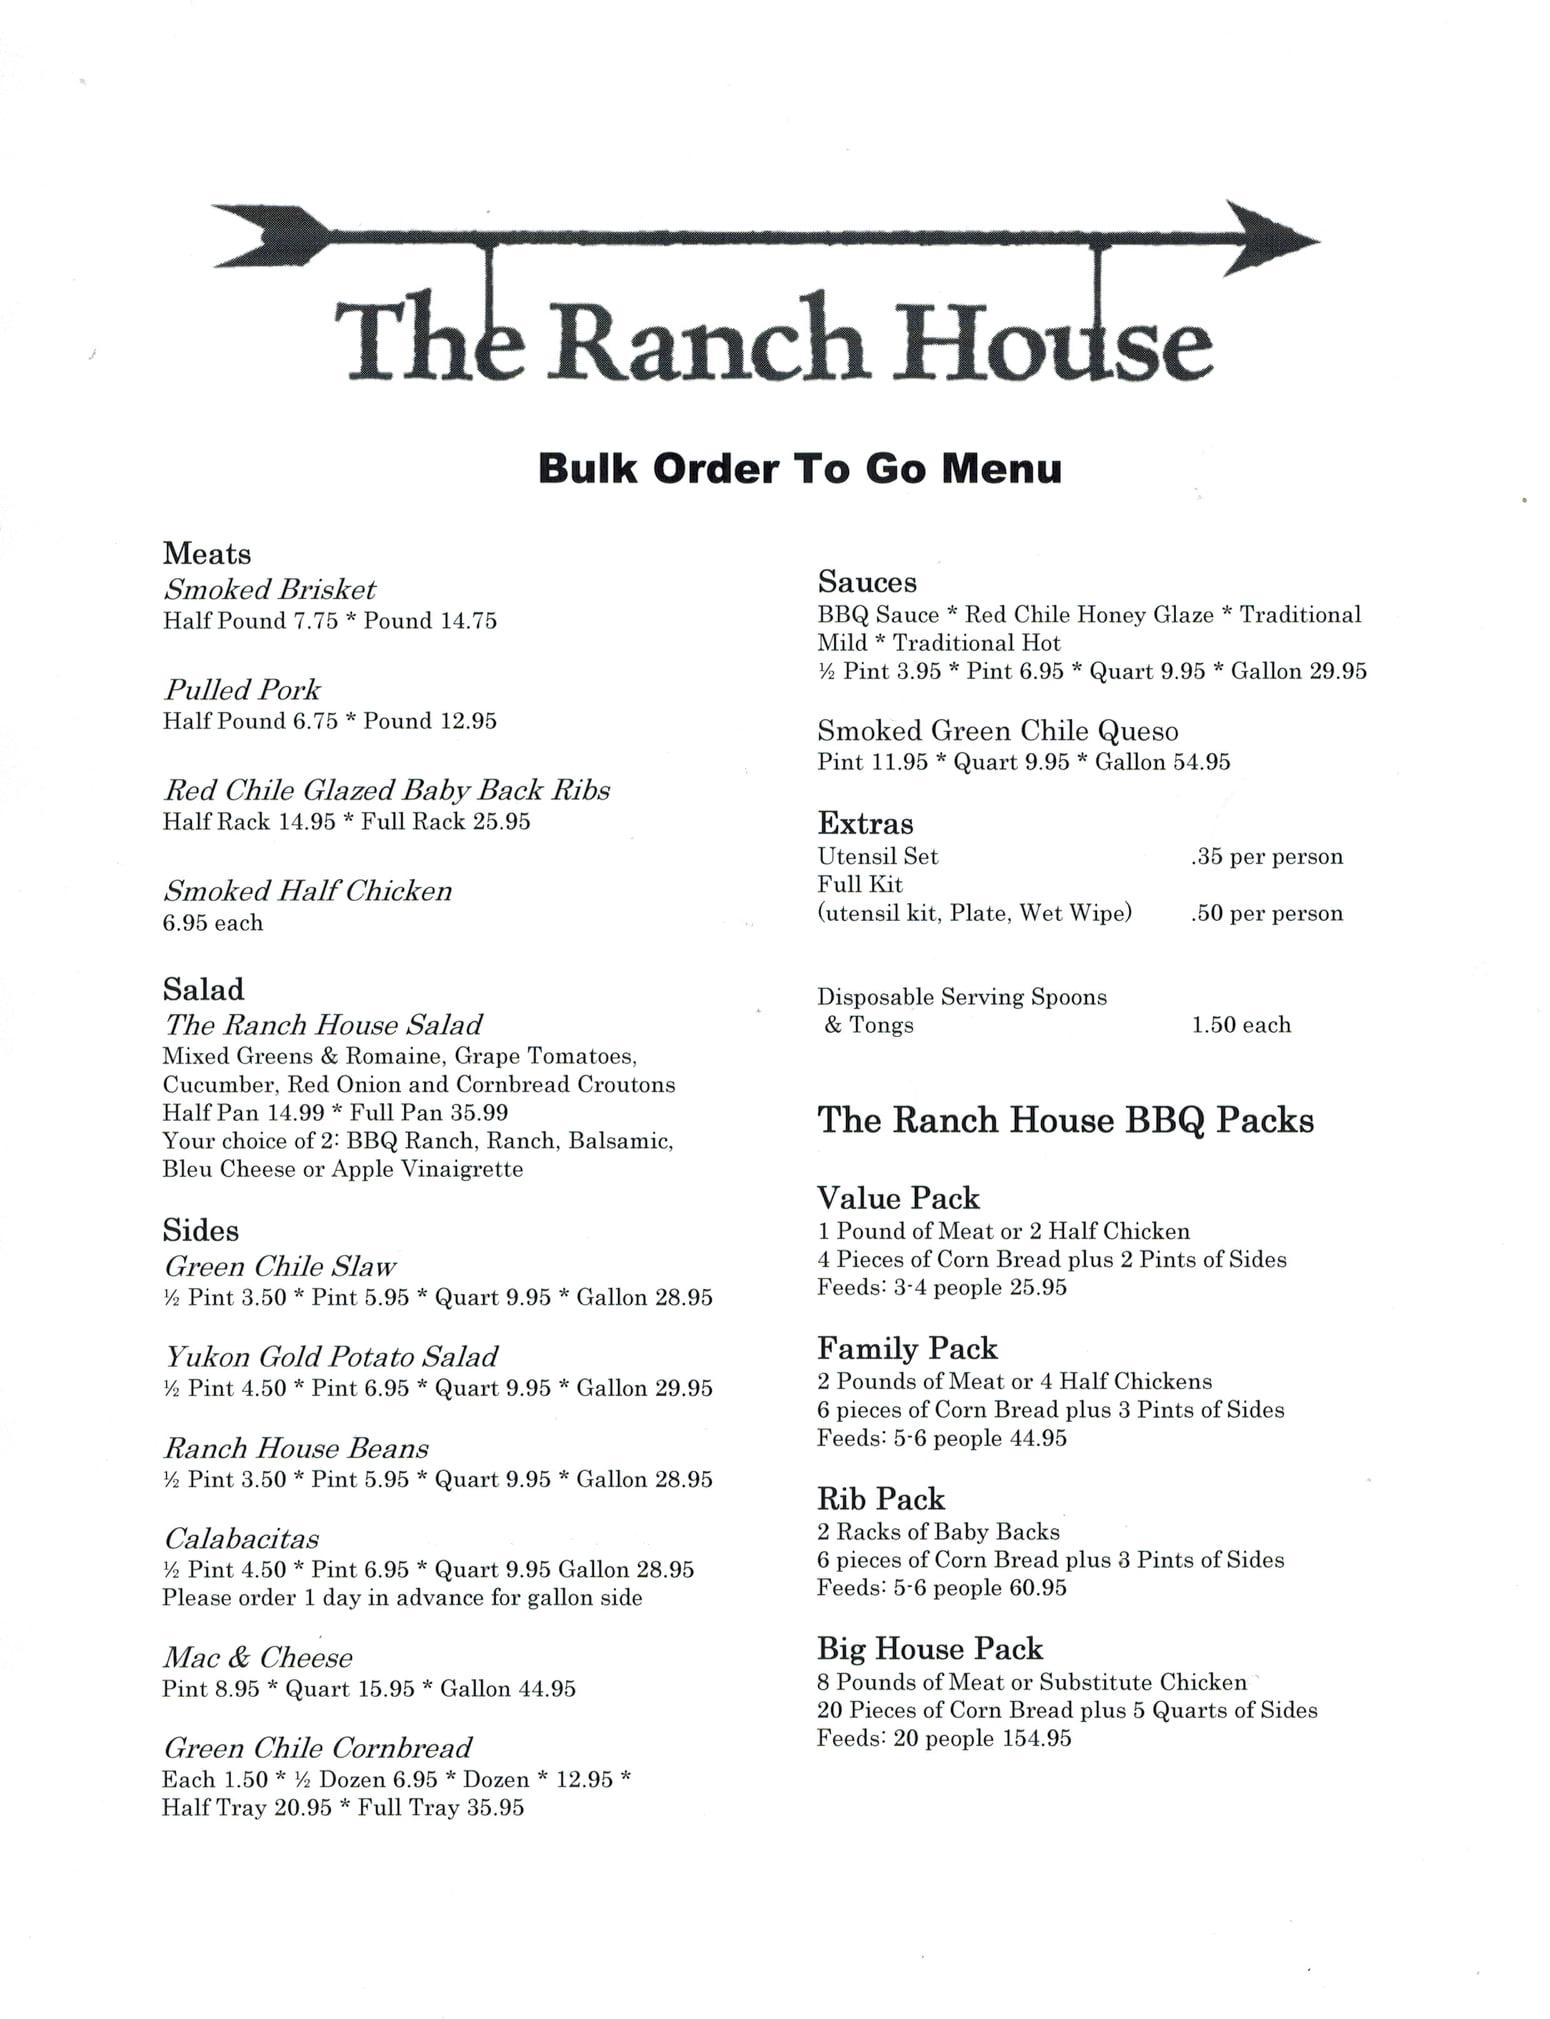 The Ranch House General Menu